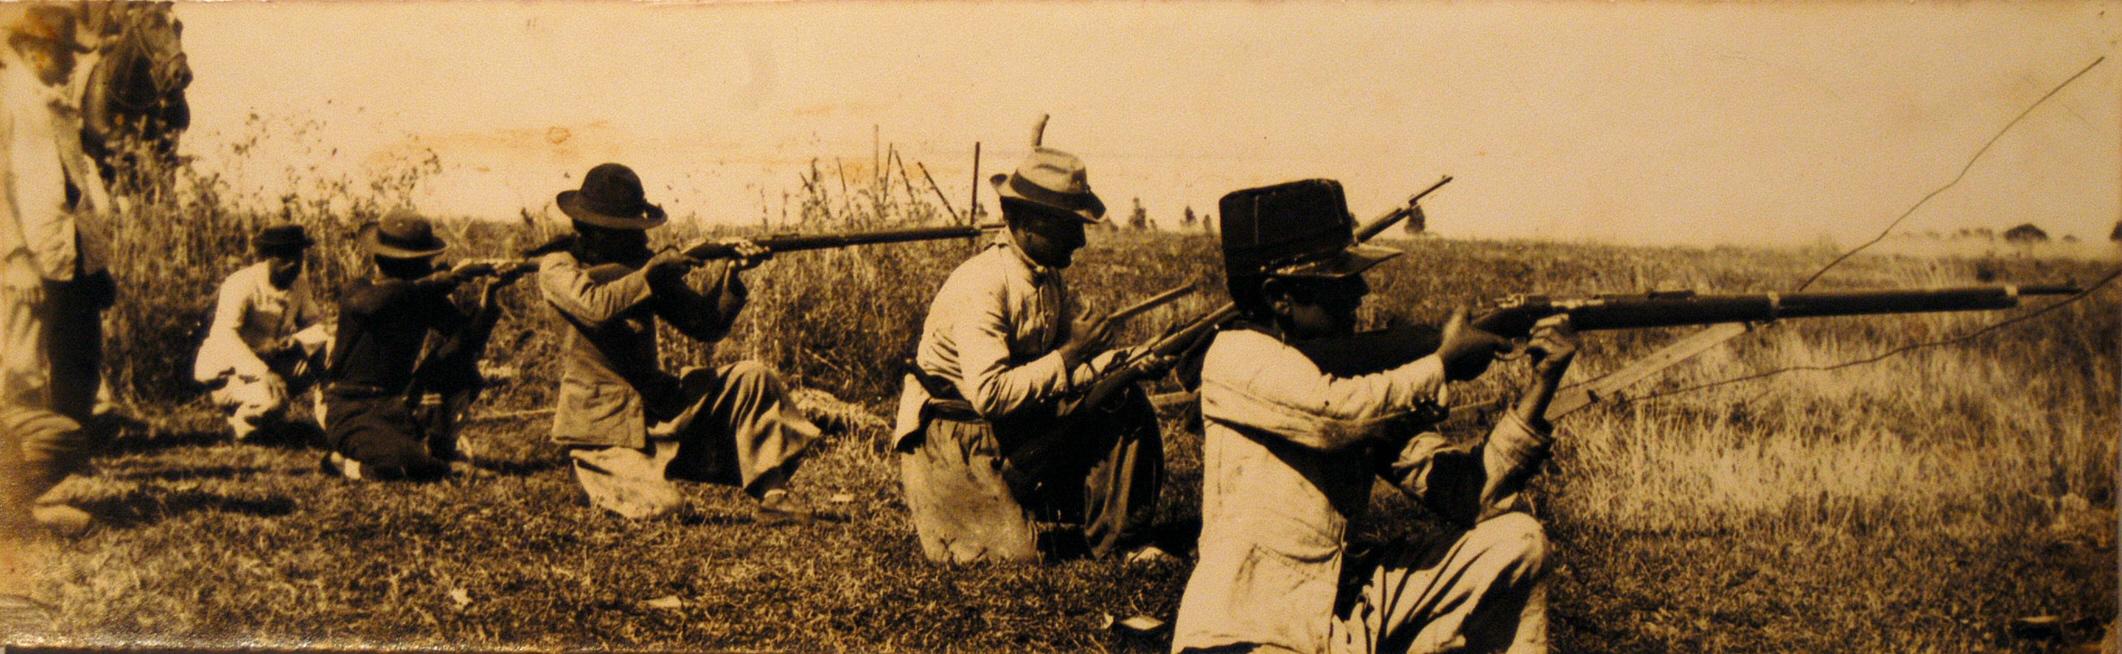 Prácticas de tiro de fuerzas saravistas.